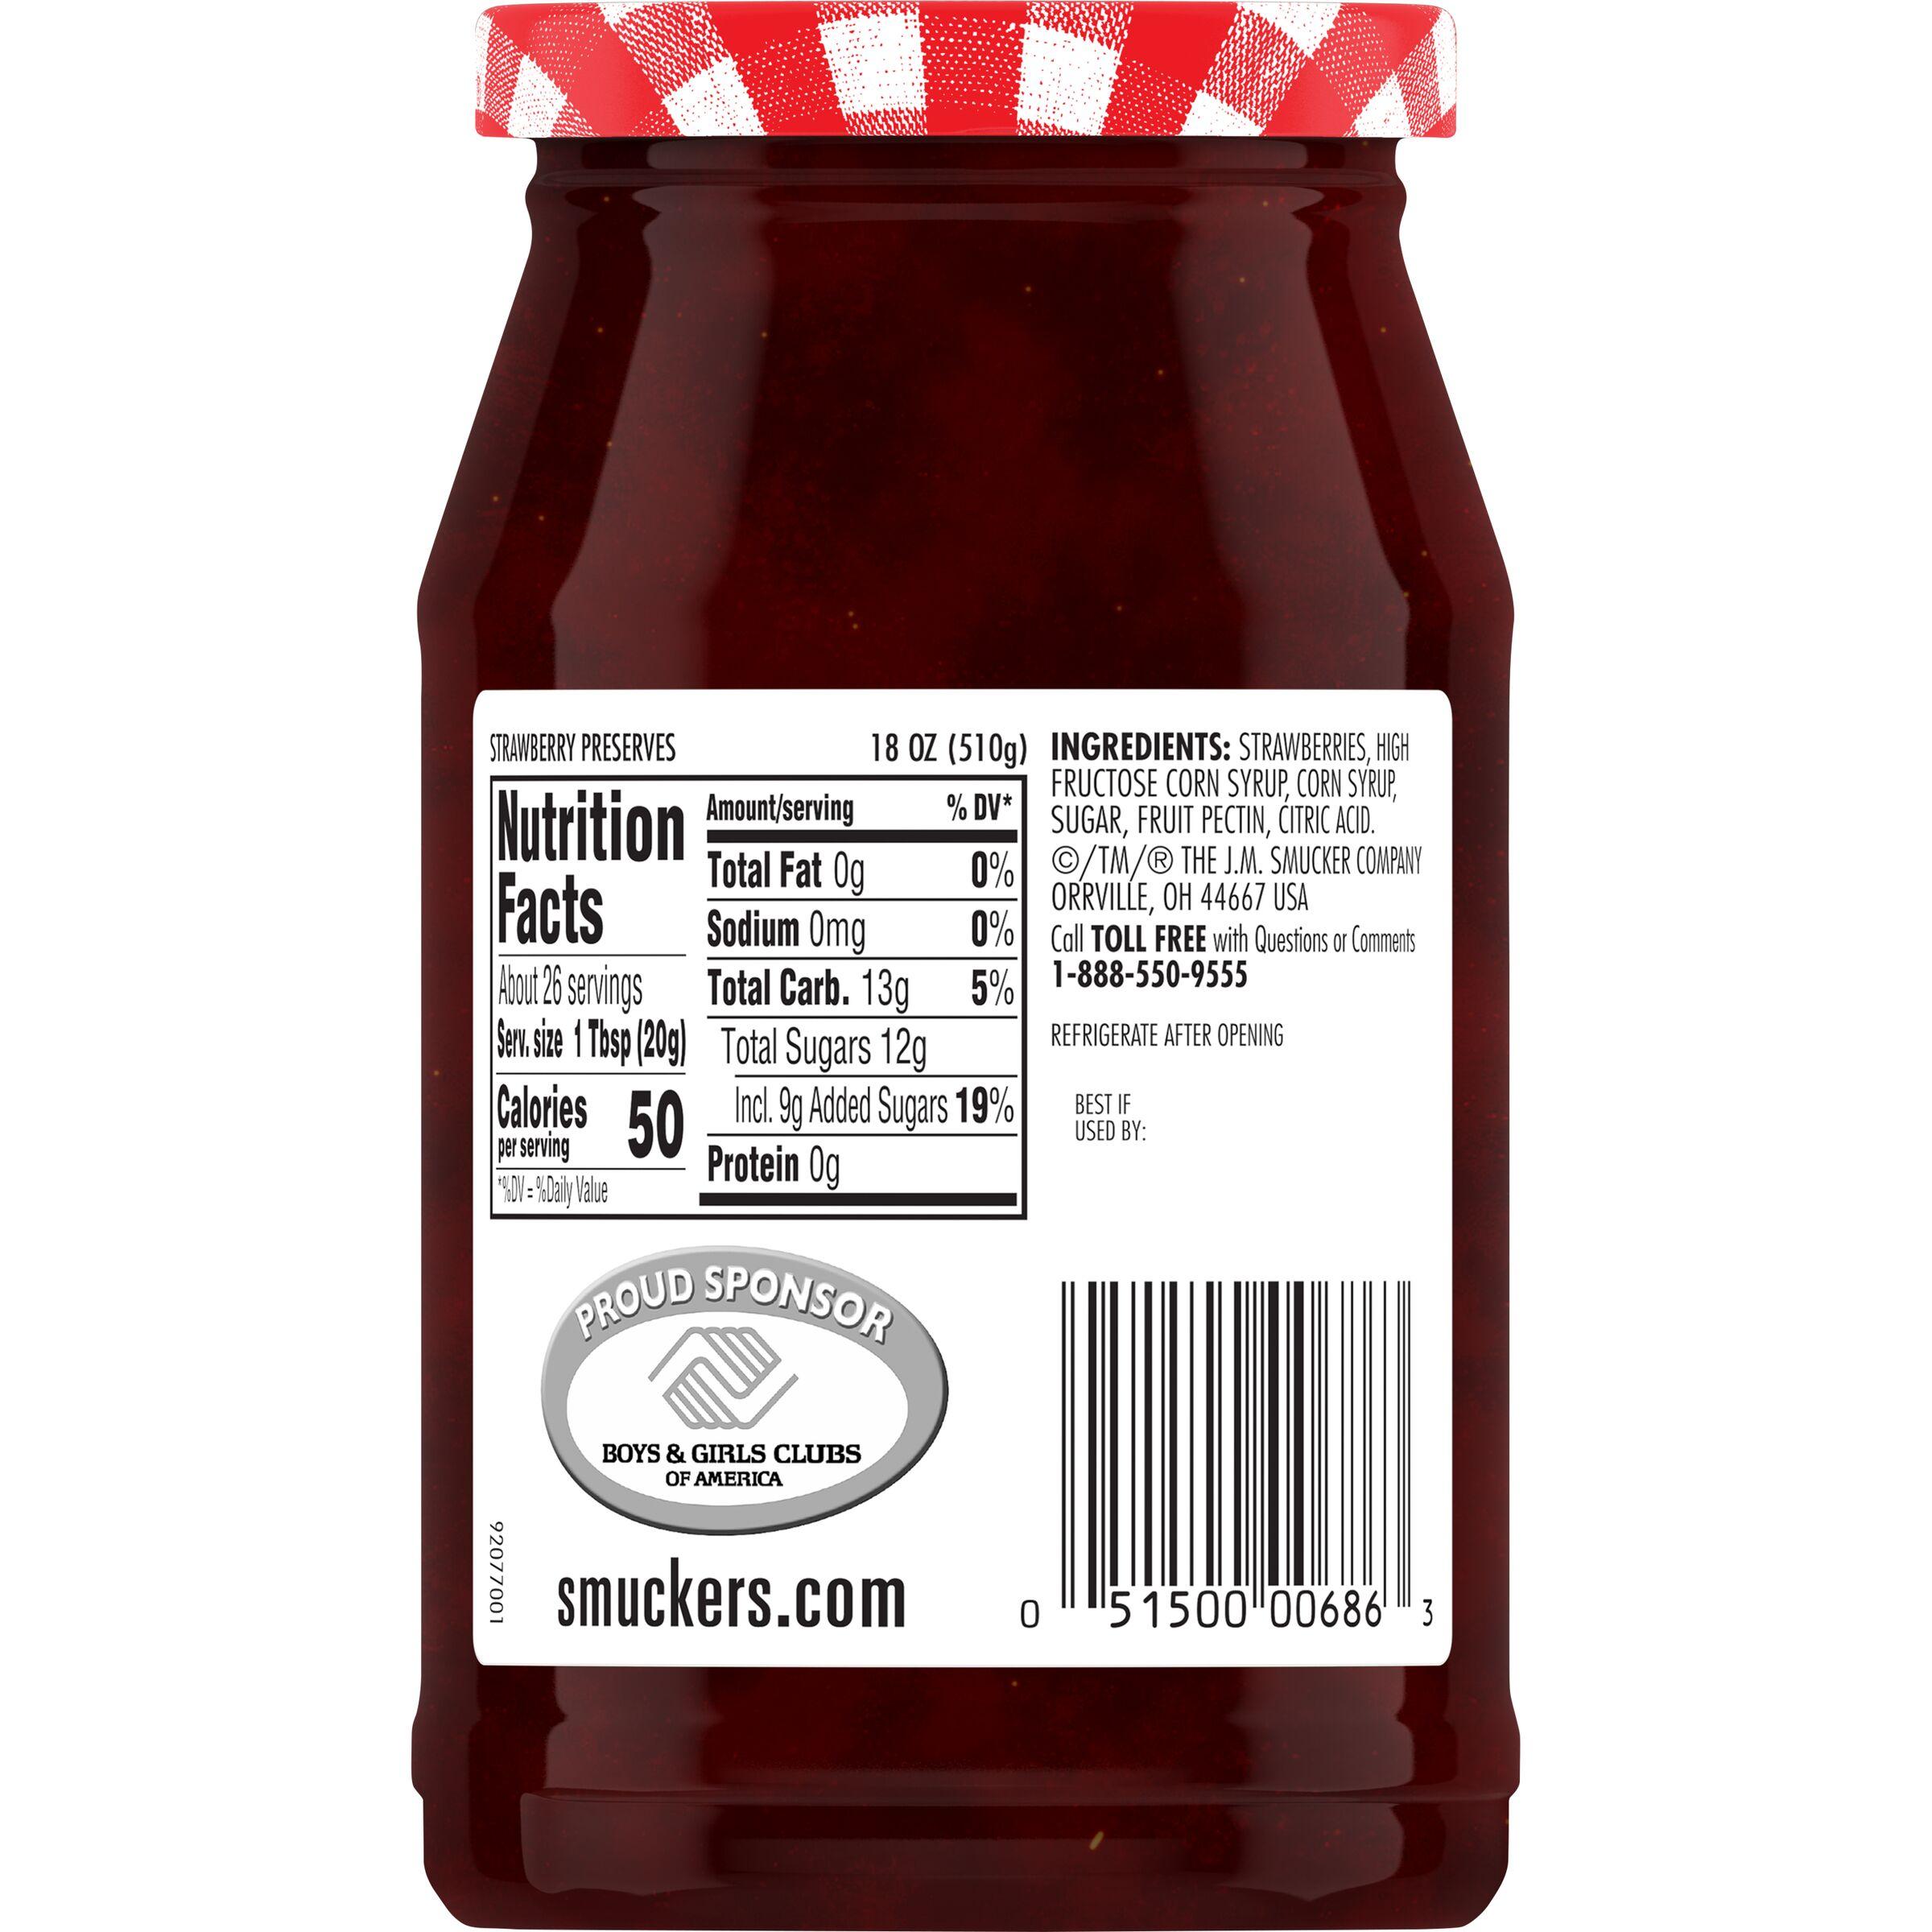 SMUCKER'S Strawberry Preserves 18 OZ